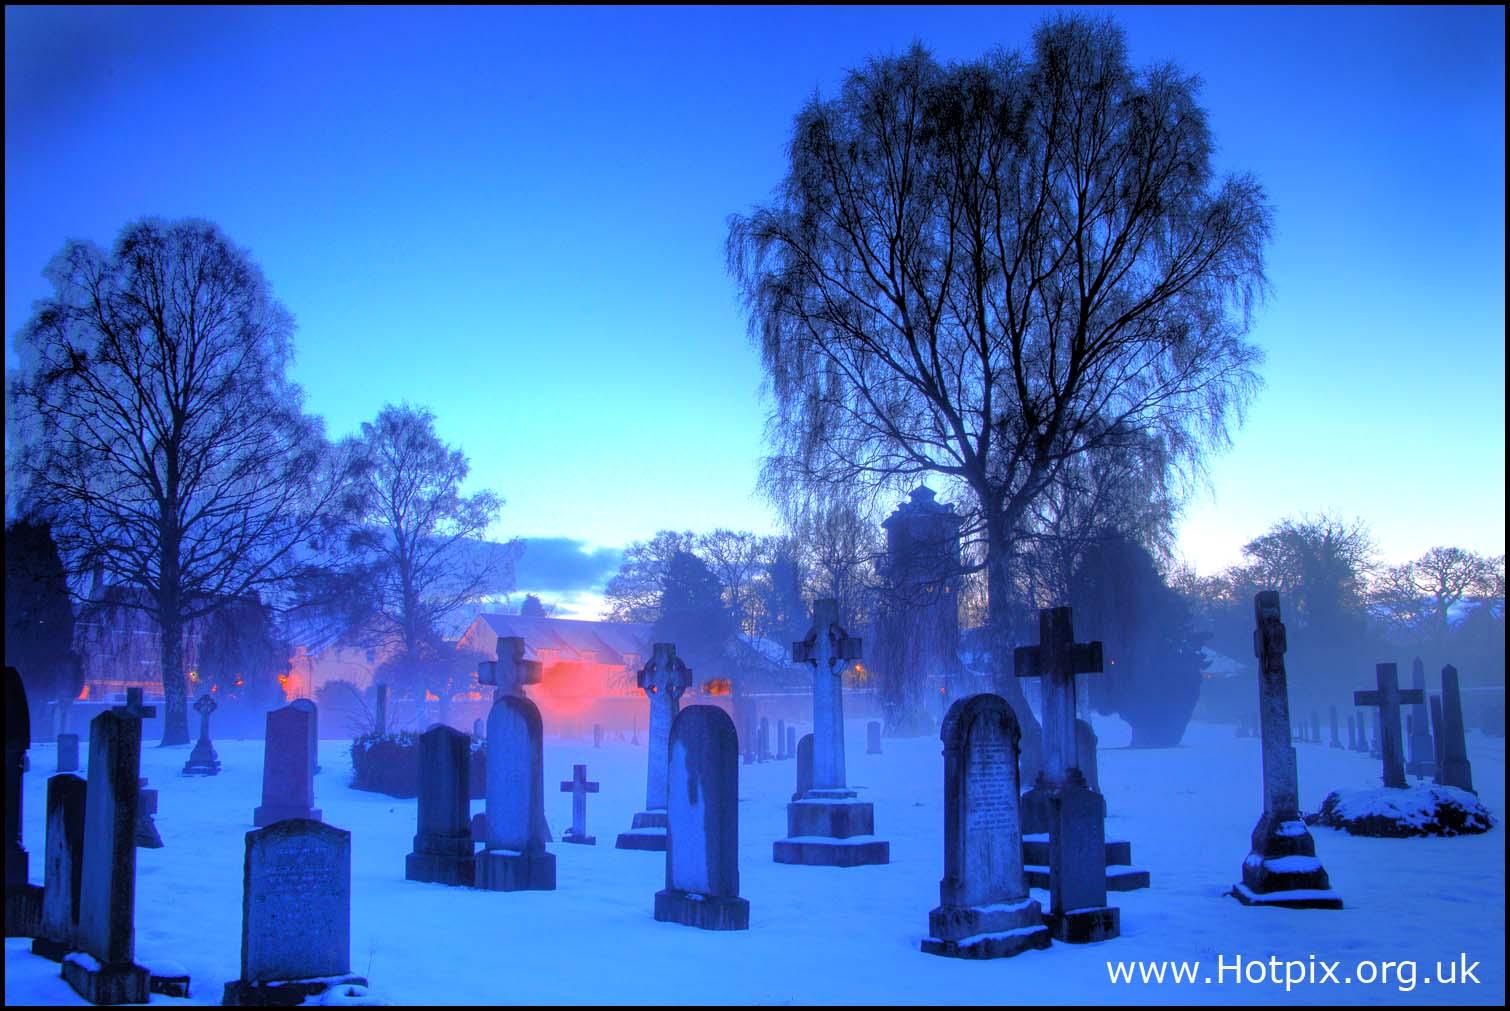 Grave,yard,stones,dusk,night,shot,tripod,snow,winter,december,2009,Dalkeith,midlothian,Scotland,cemetery,cemetary,cematary,UK,blue,orange,fog,cross,crosses,spooky,Schotland,l'Ecosse,Ecosse,Schottland,\u03a3\u03ba\u03c9\u03c4\u03af\u03b1,la,Scozia,\u30b9\u30b3\u30c3\u30c8\u30e9\u30f3\u30c9,\uc2a4\ucf54\ud2c0\ub780\ub4dc,\u0428\u043e\u0442\u043b\u0430\u043d\u0434\u0438\u044f,Escocia,\u96ea,sneeuw,neige,Schnee,\u0441\u043d\u0435\u0436\u043e\u043a,nieve,Edinburghe,HDR,high dynamic range,tonysmith,tony,smith,dark,disturbia,graves,tomb,tombs,cemetario,interesting,place,places,gravestone,gravestones,crypt,noche,nuit,edinbrugh,hotpix!,Edinburg,#tonysmithhotpix,edimburgh